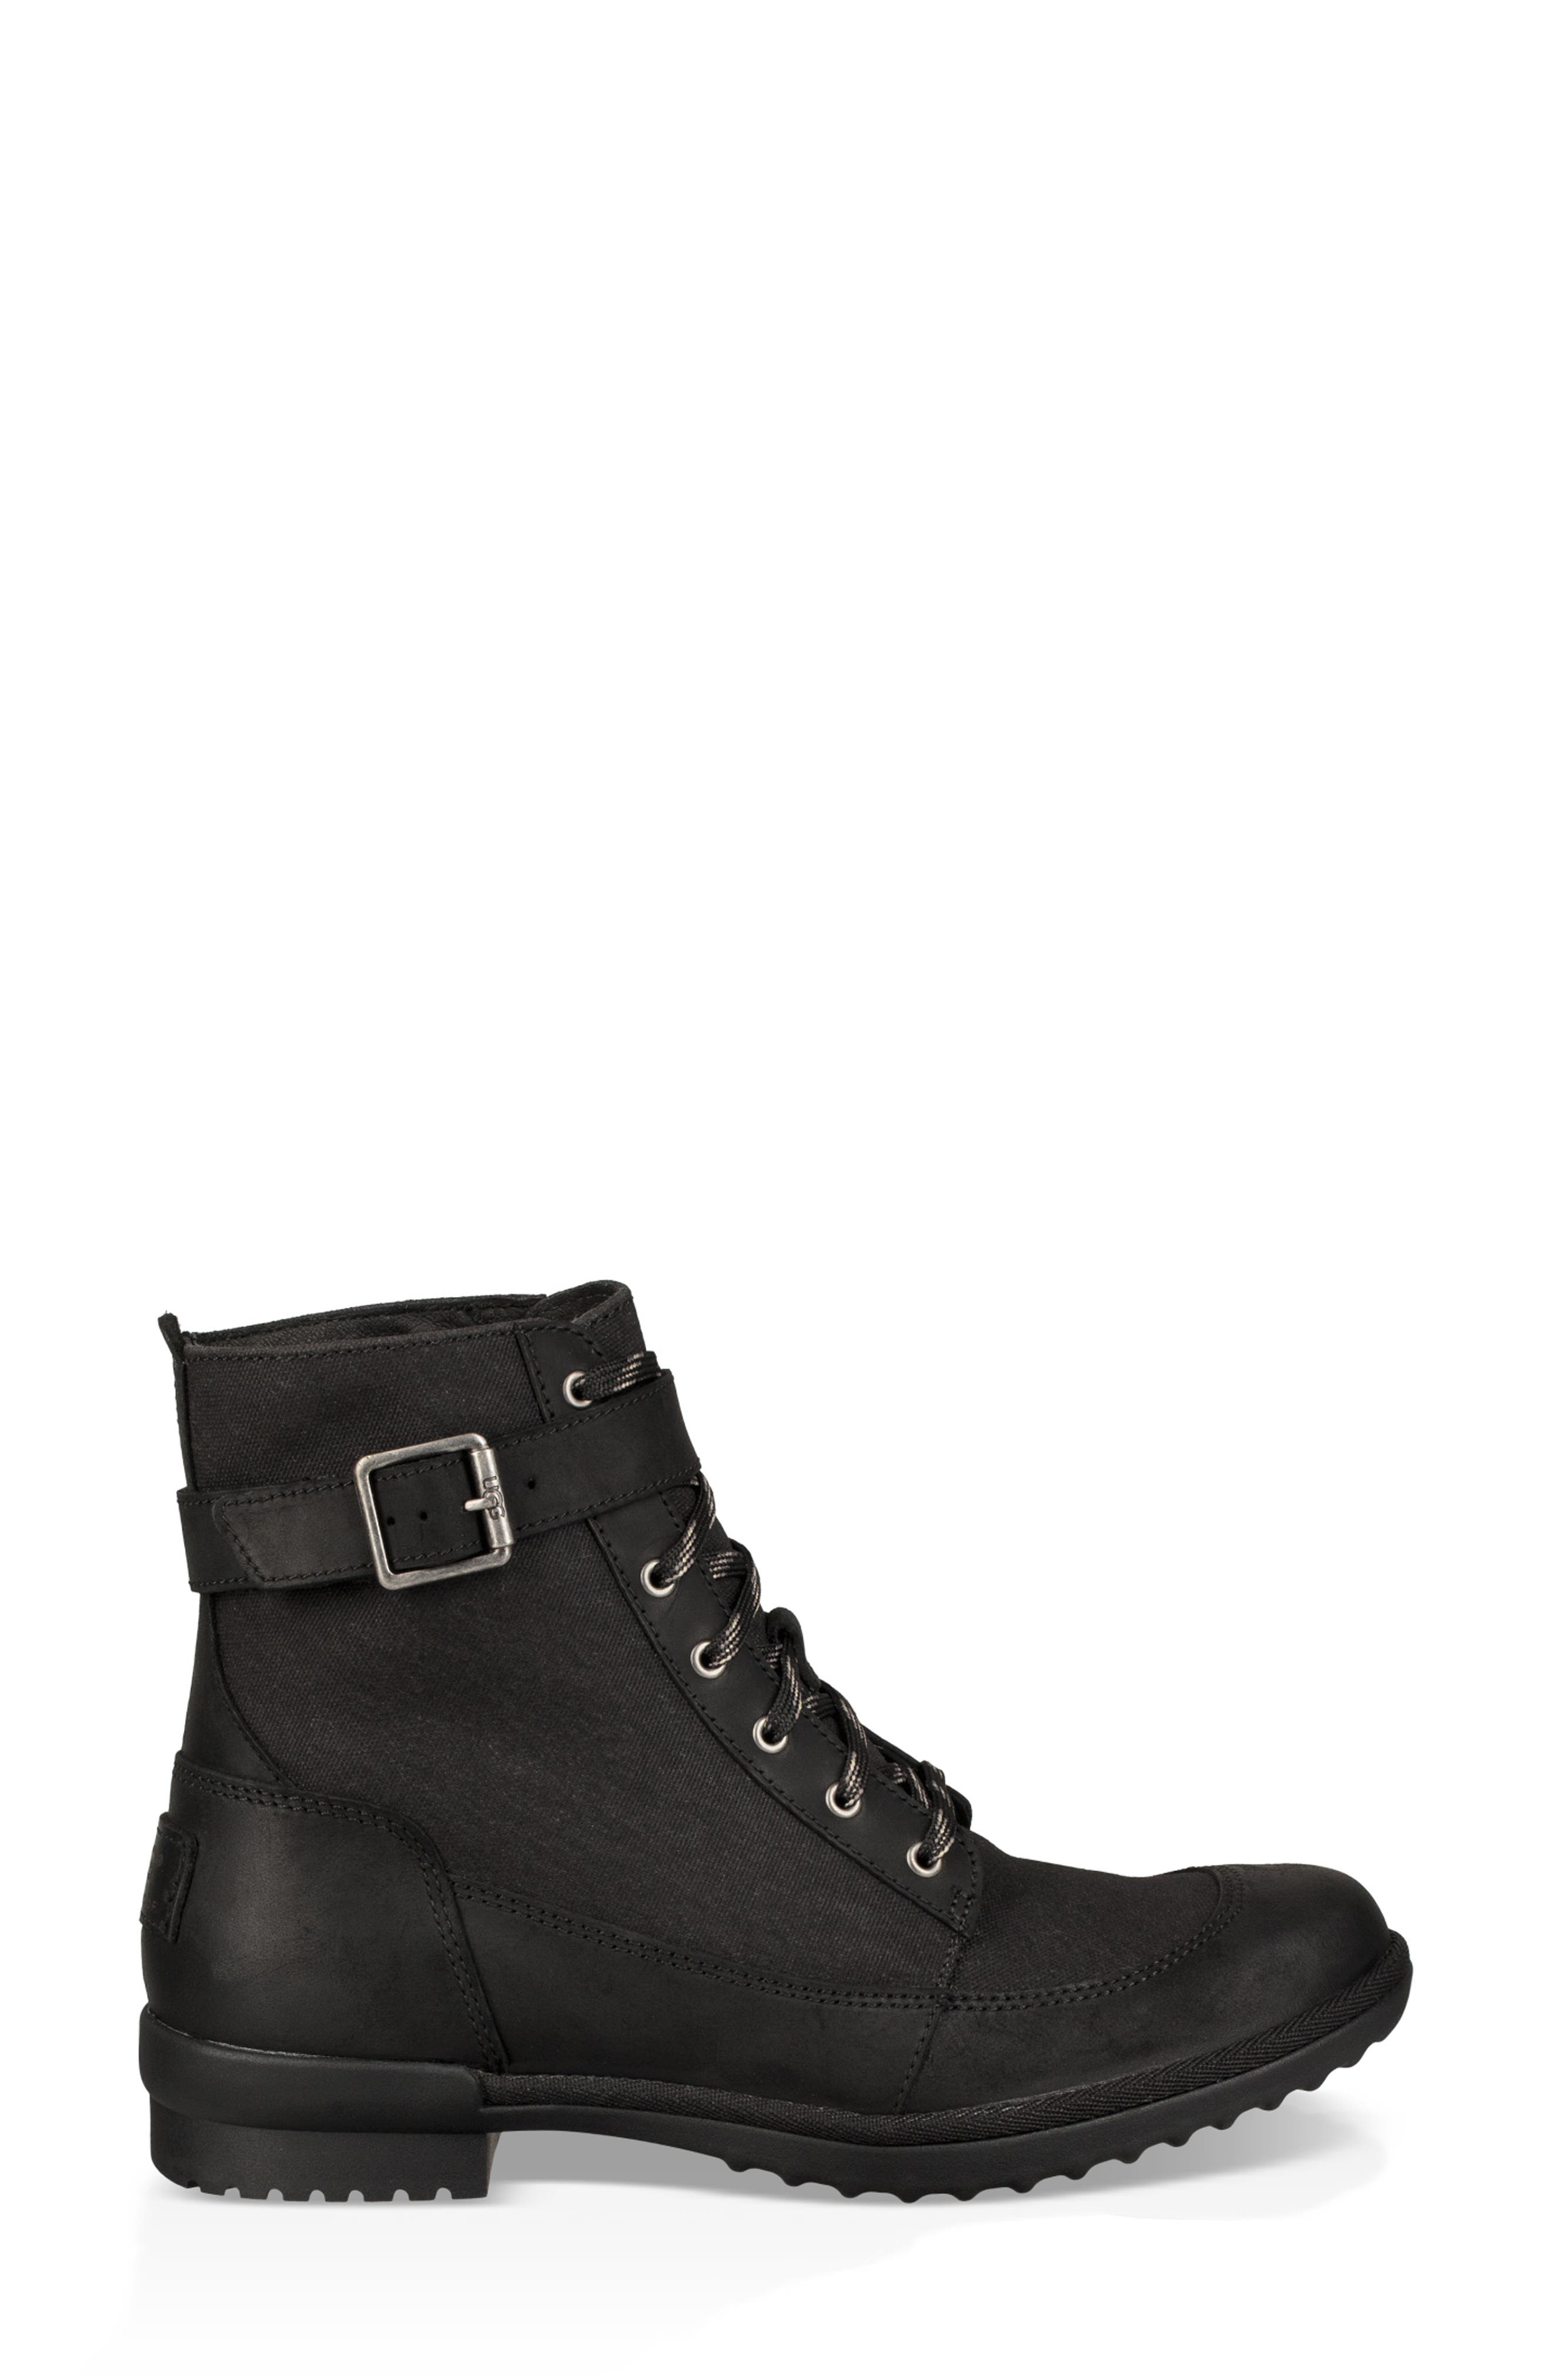 Tulane Waterproof Boot,                             Alternate thumbnail 3, color,                             BLACK LEATHER